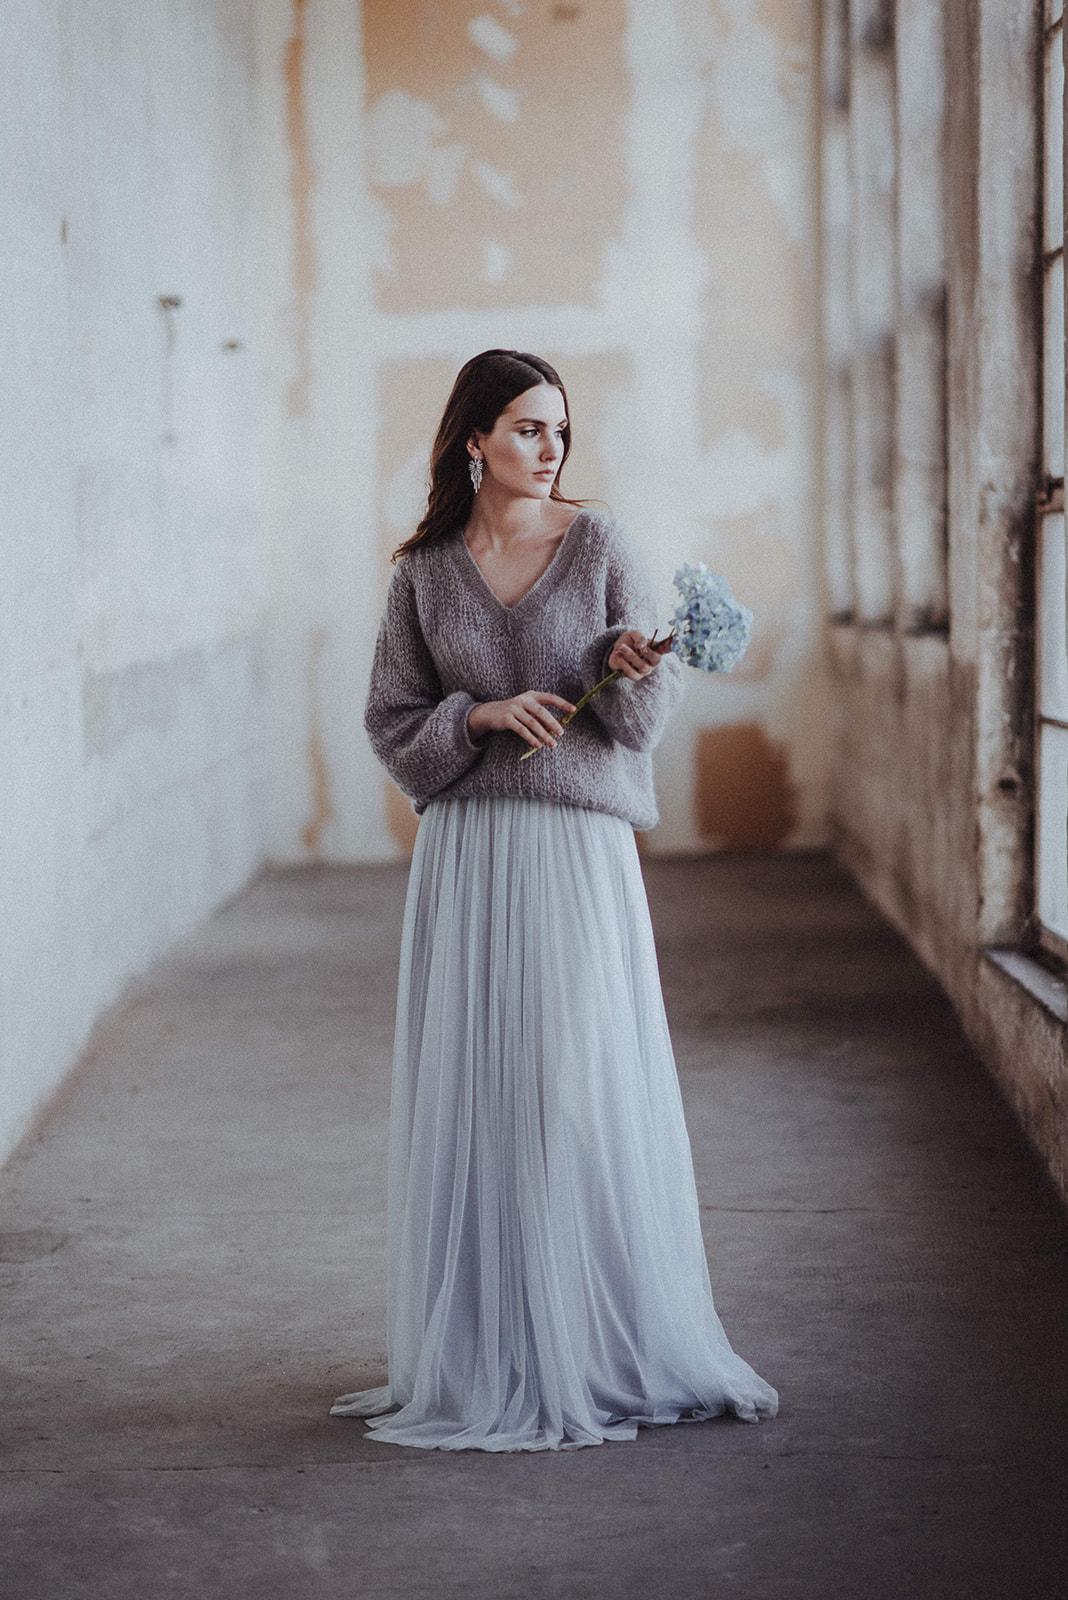 Boho Glam Brautkleid Inspiration in Blau-Grau und Silber